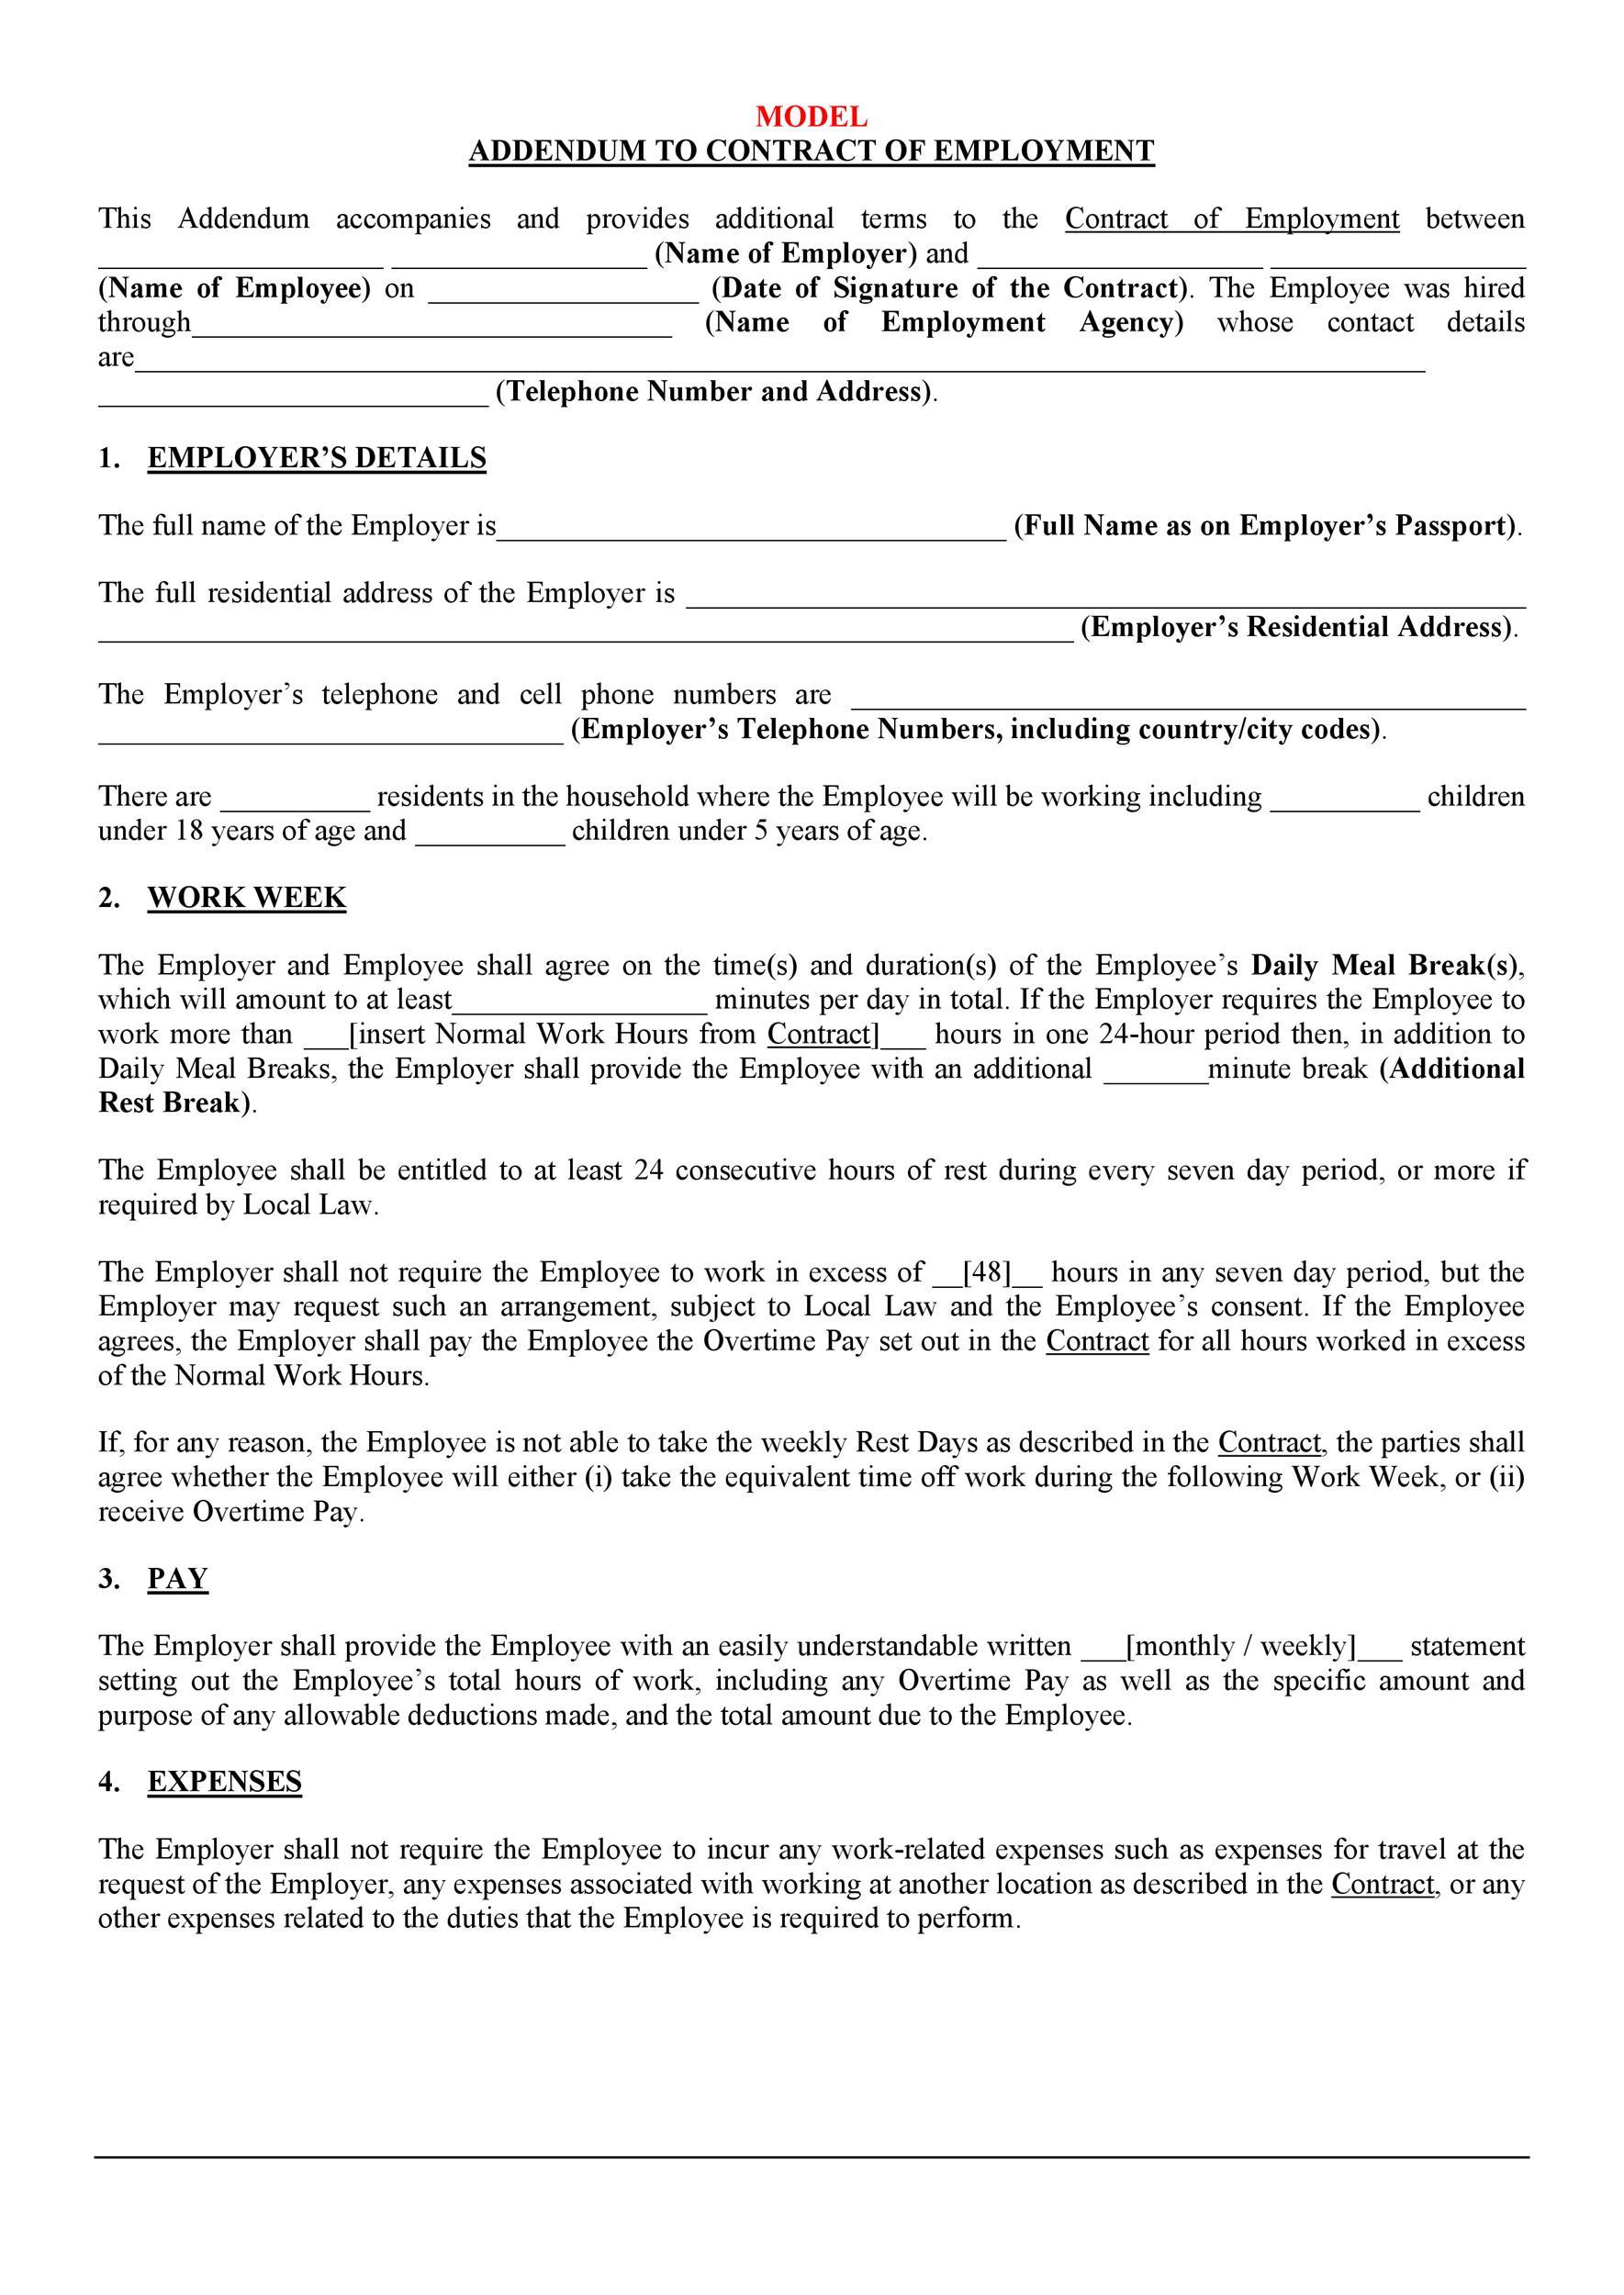 Free contract amendment 30